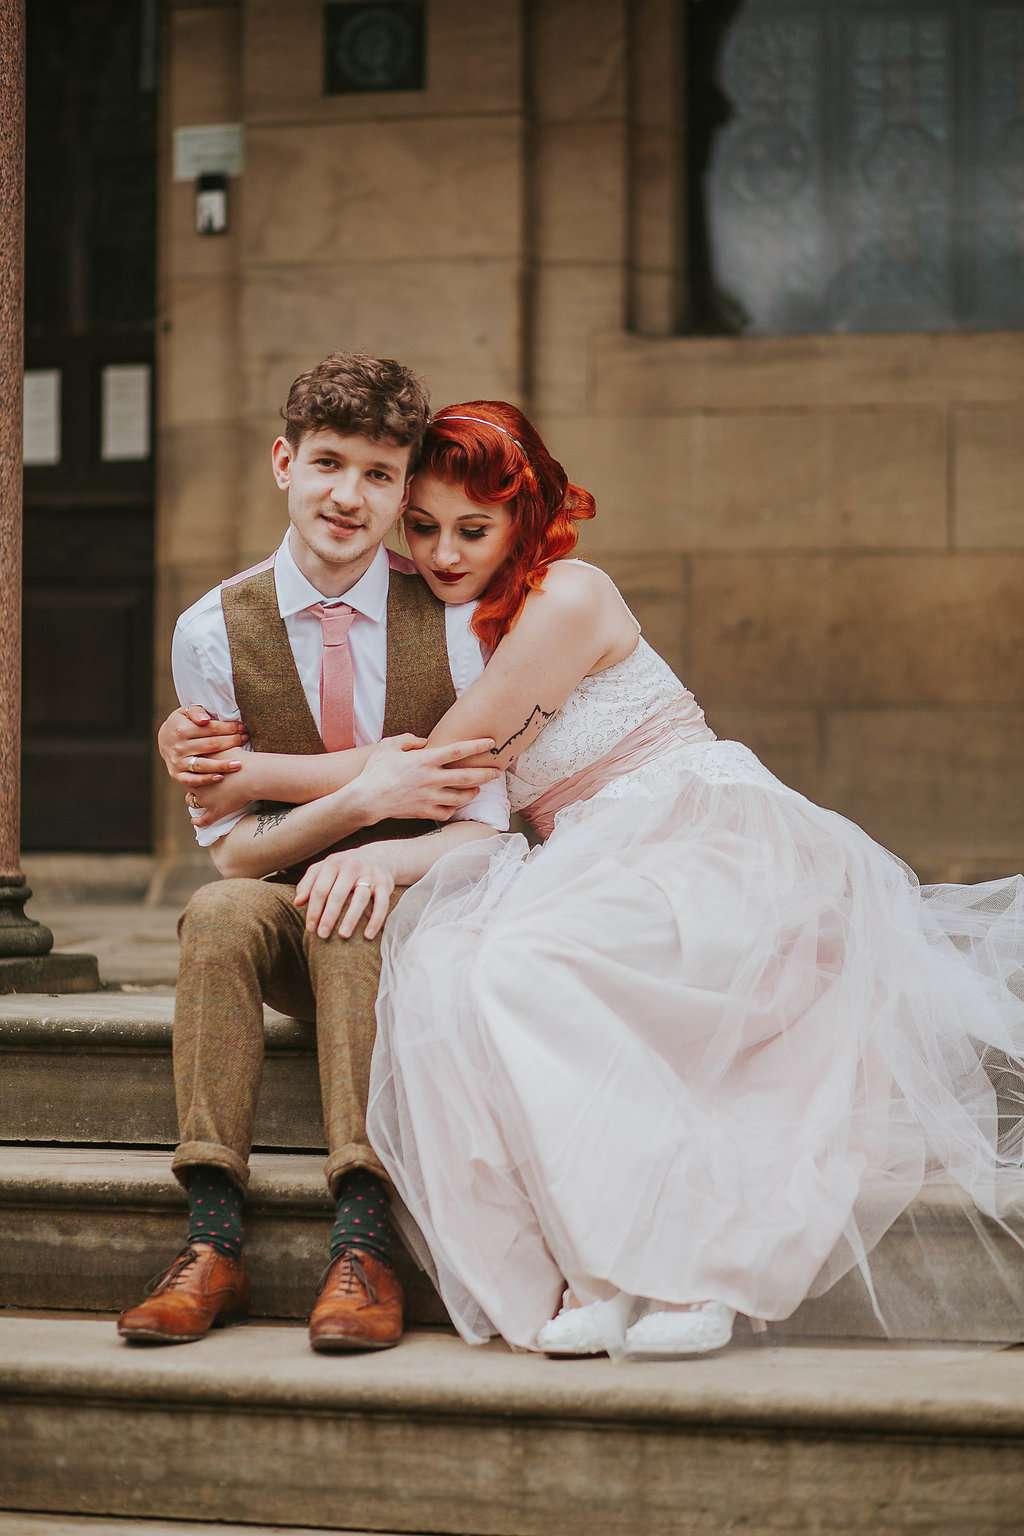 An Authentically Vintage Yorkshire Wedding · Rock n Roll Bride